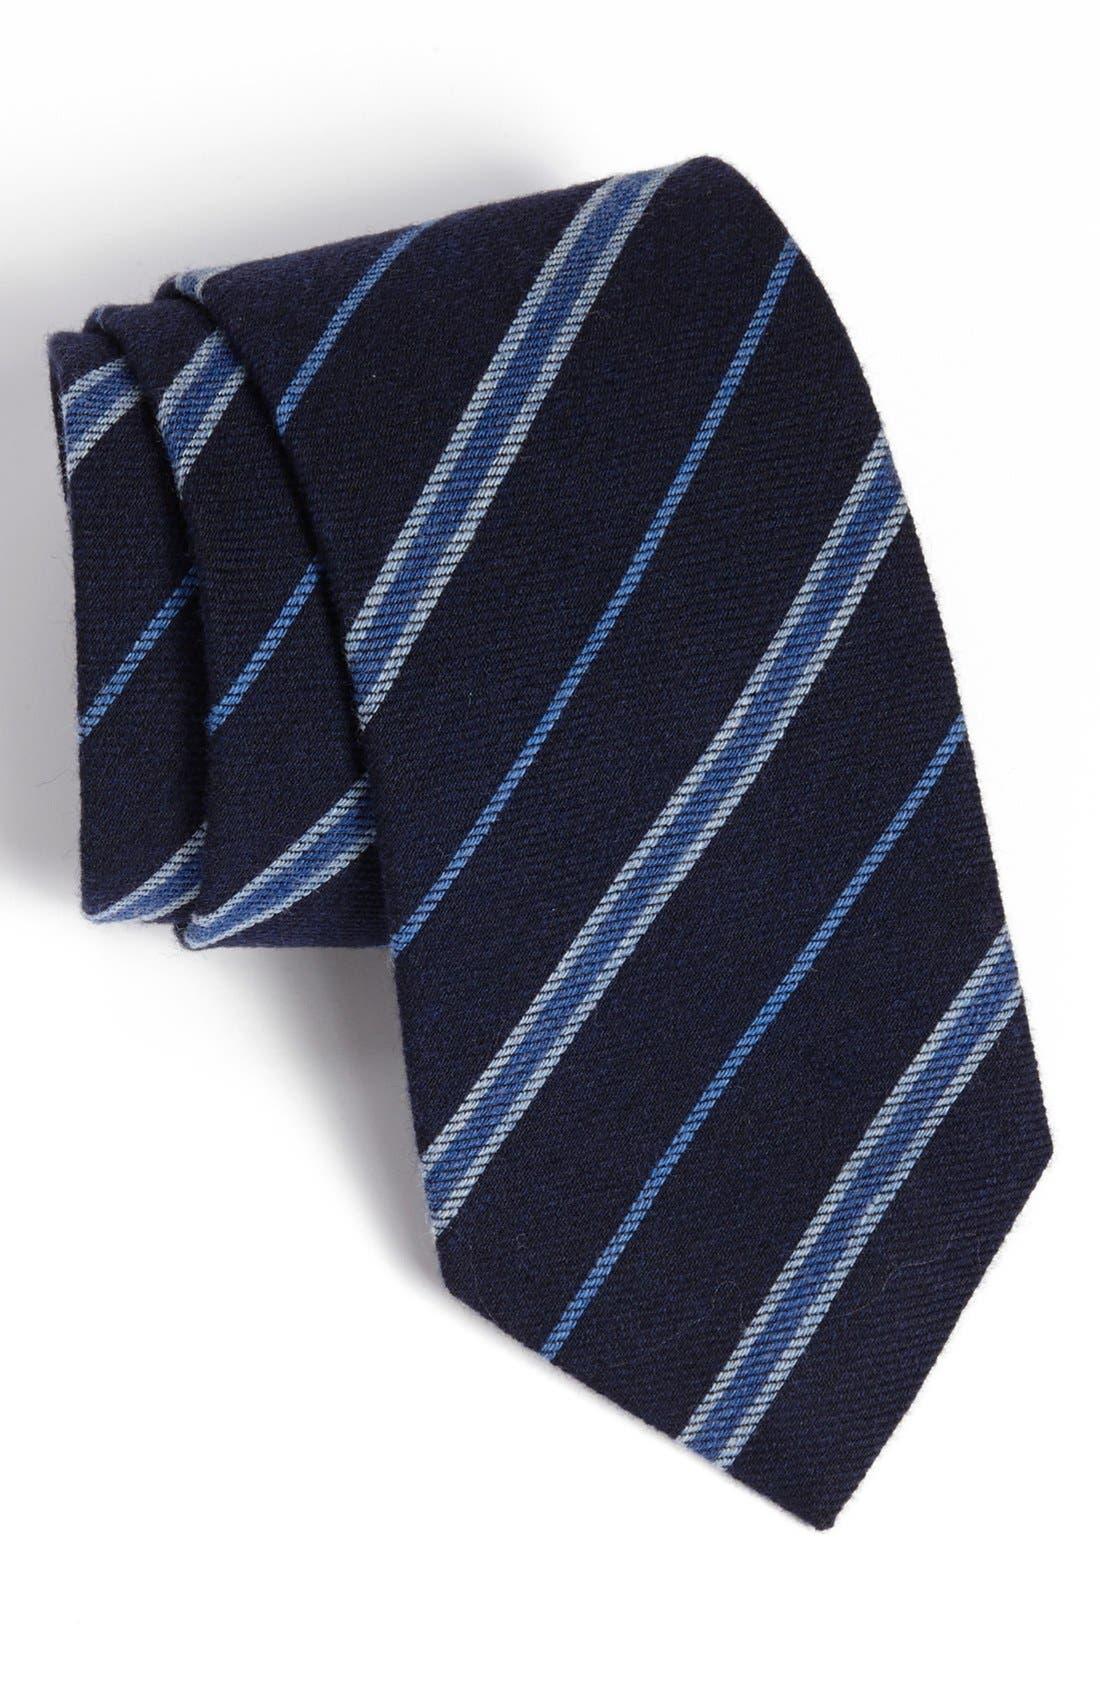 Main Image - John W. Nordstrom® Woven Wool Tie